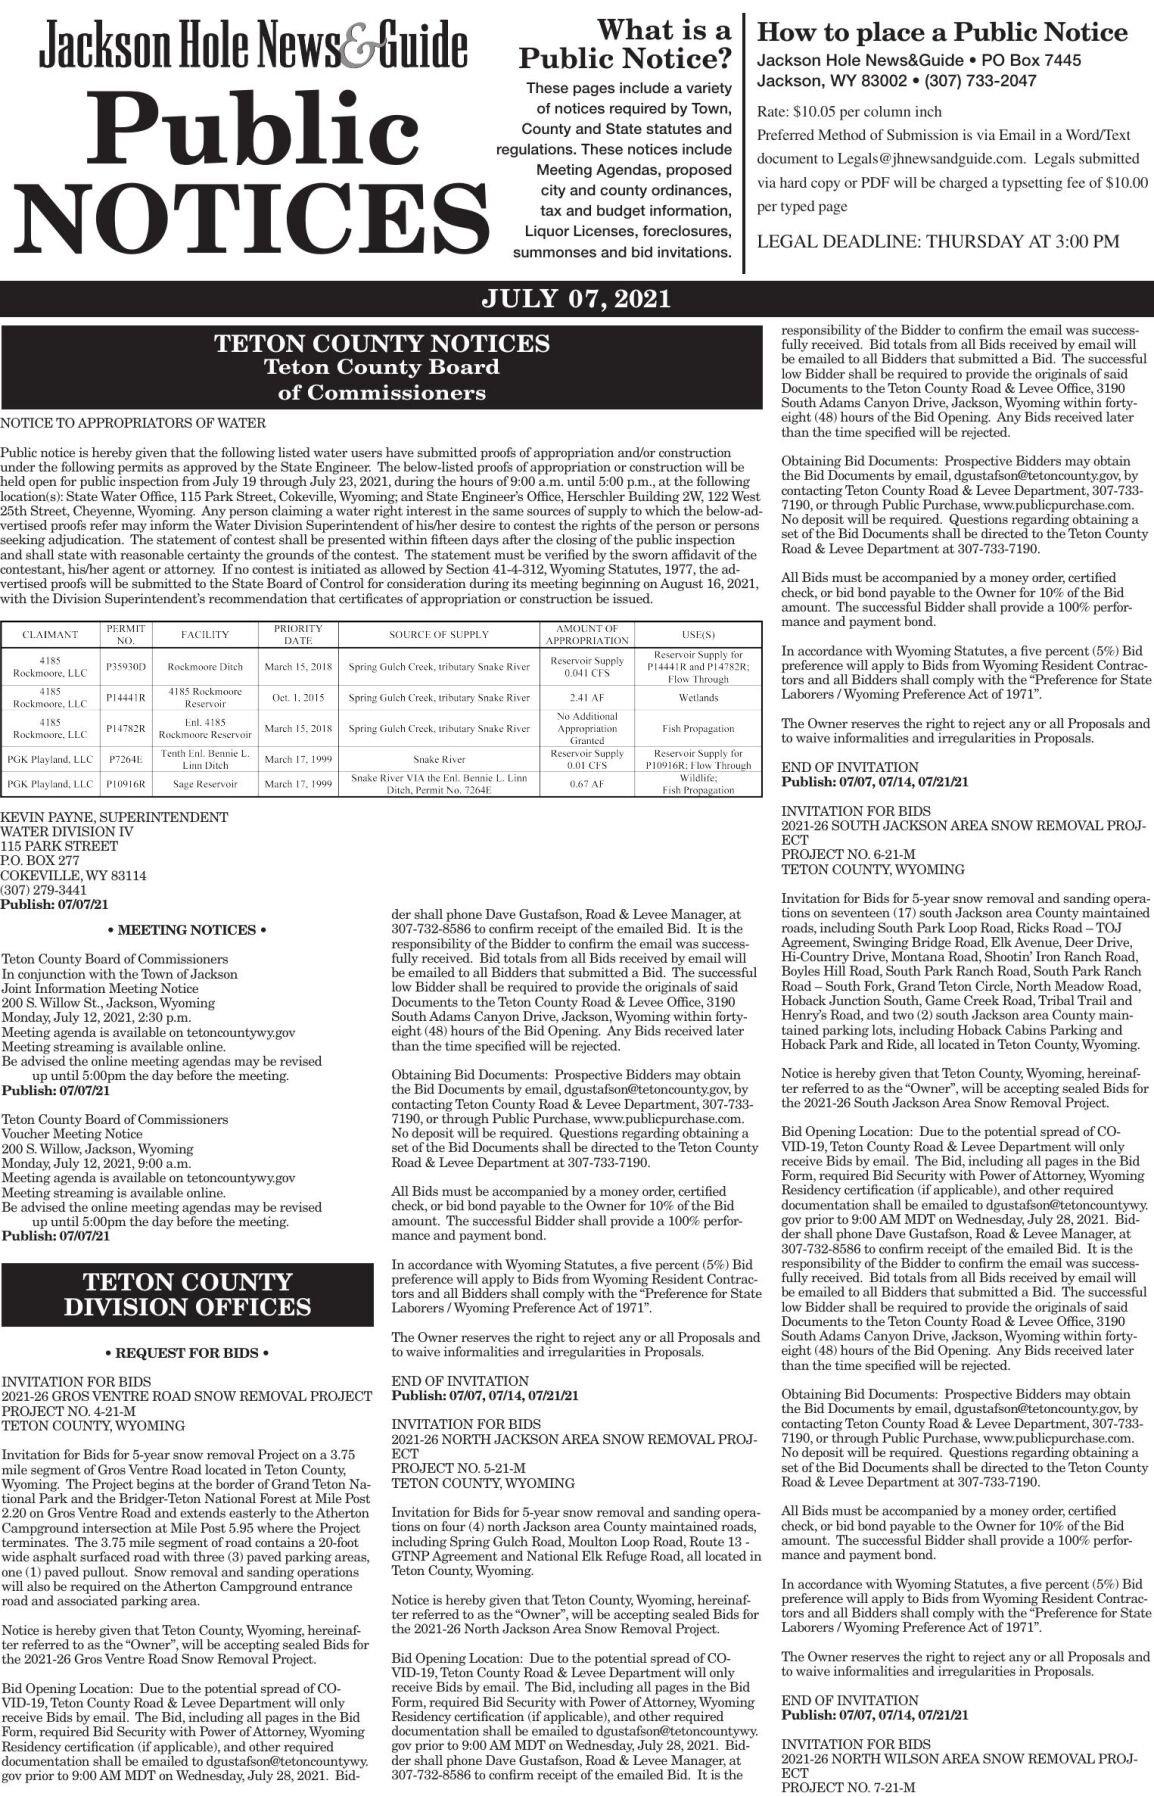 Public Notices, July 07, 2021